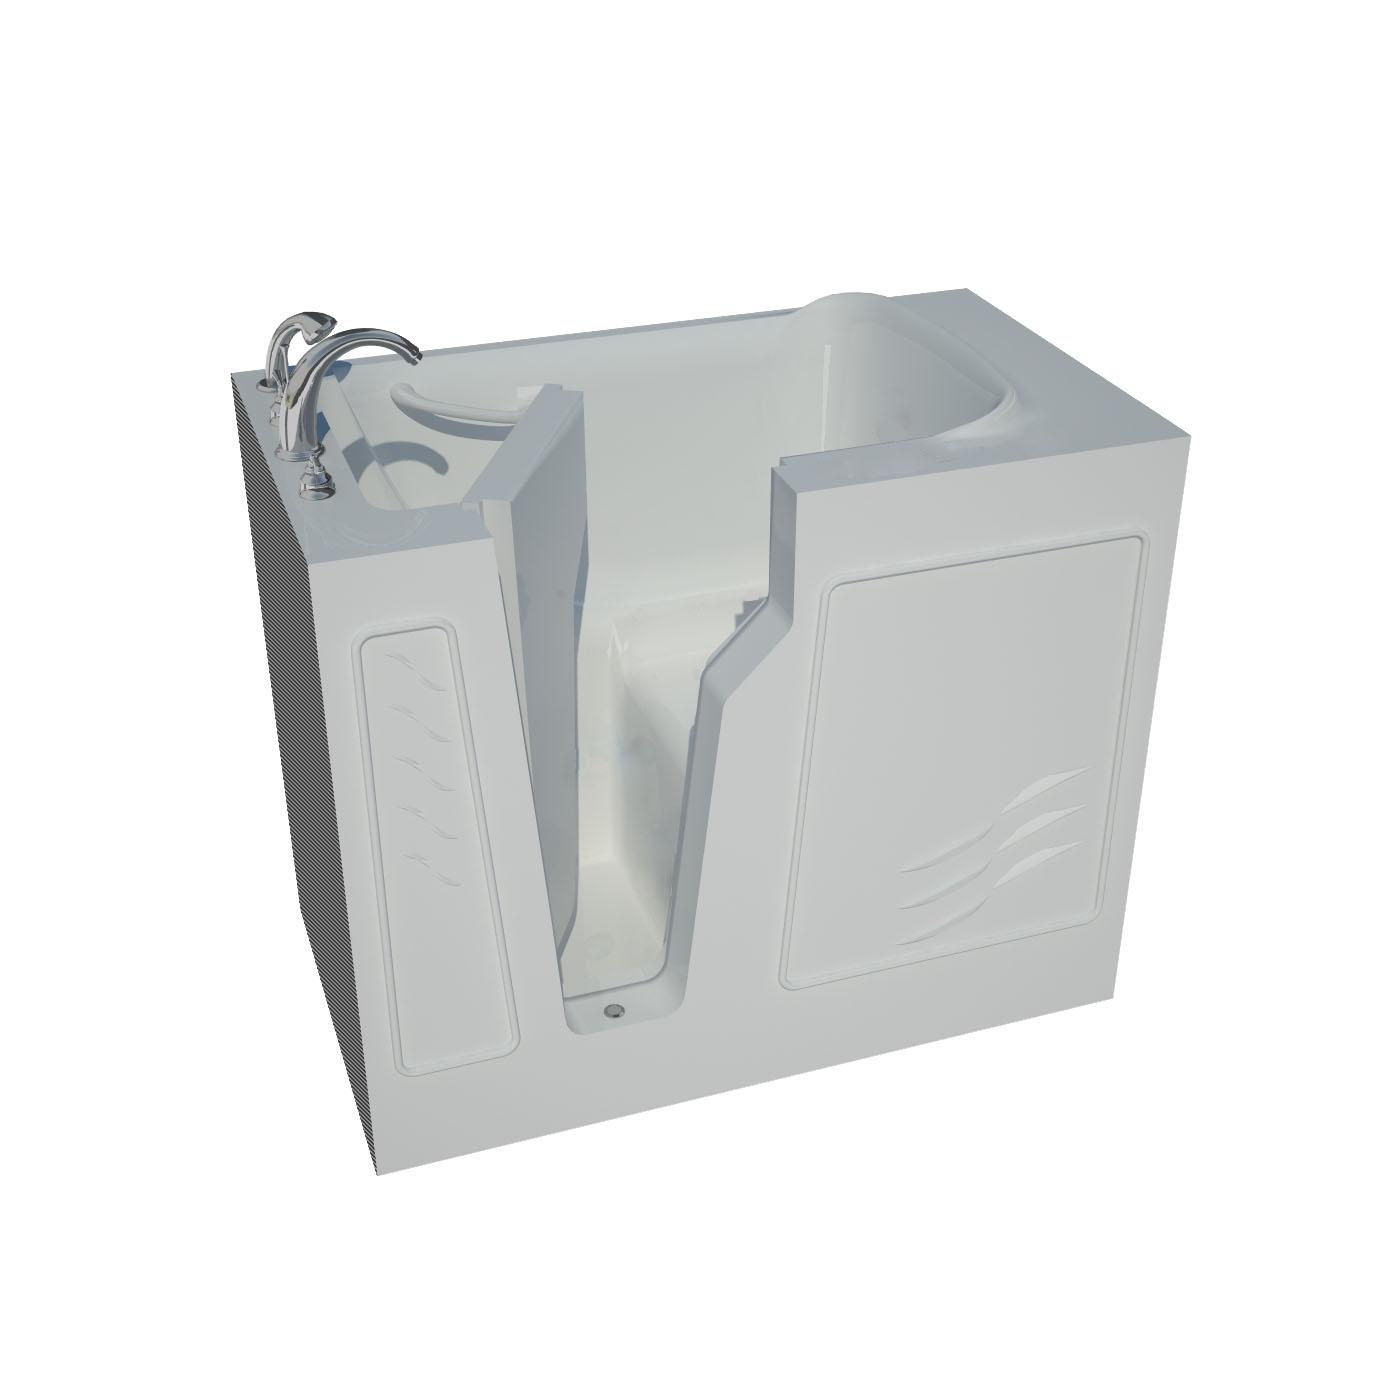 26 x 46 Left Drain Soaking Walk-In Bathtub in White